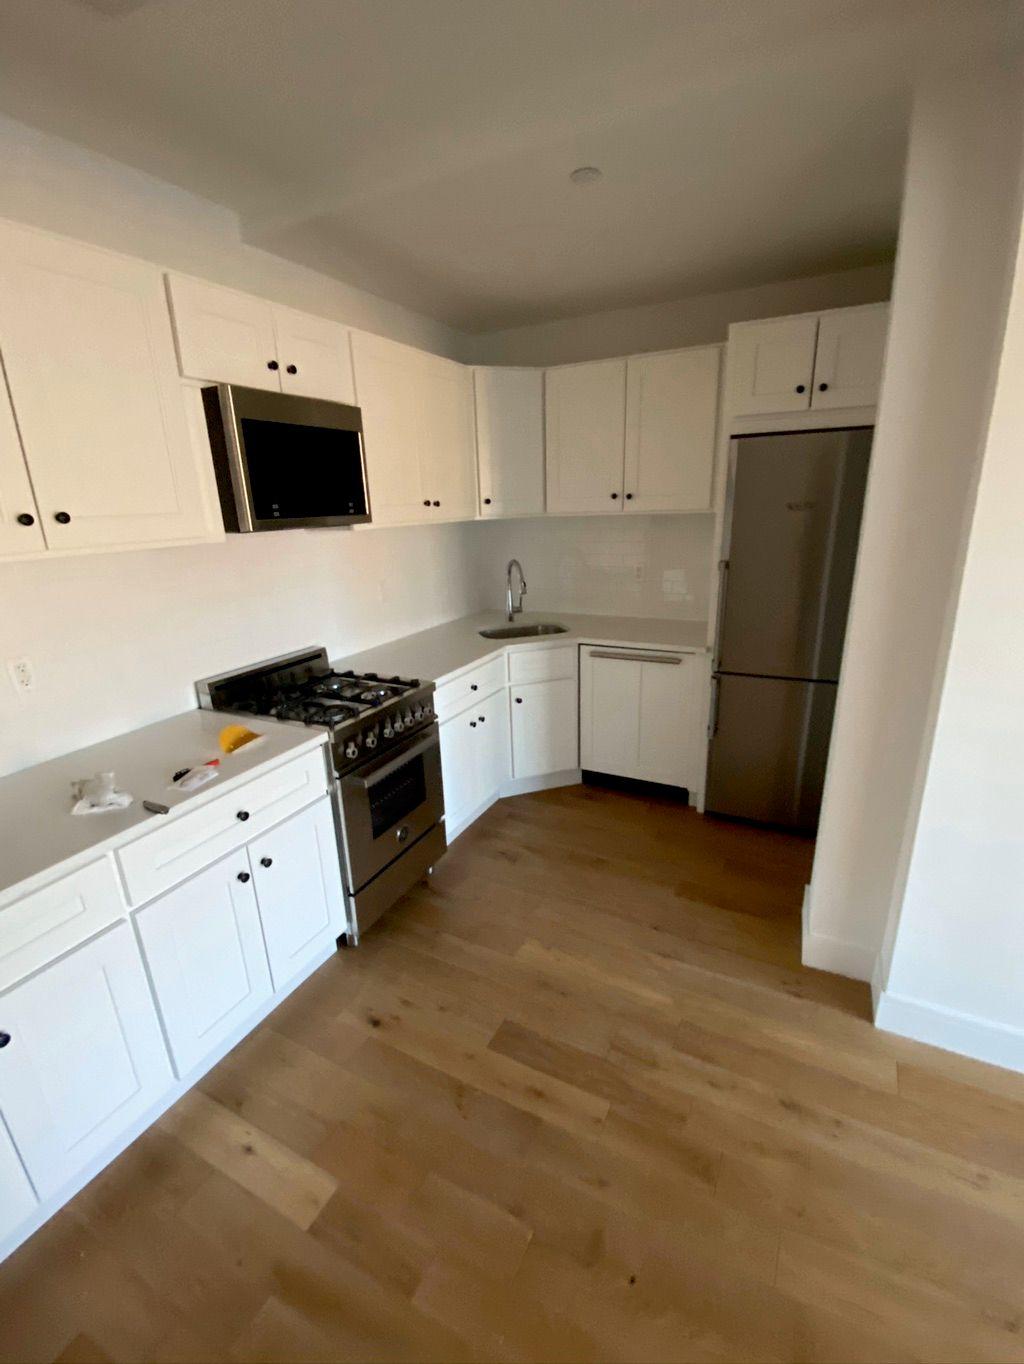 5 Boro Flooring & Interior Renovations